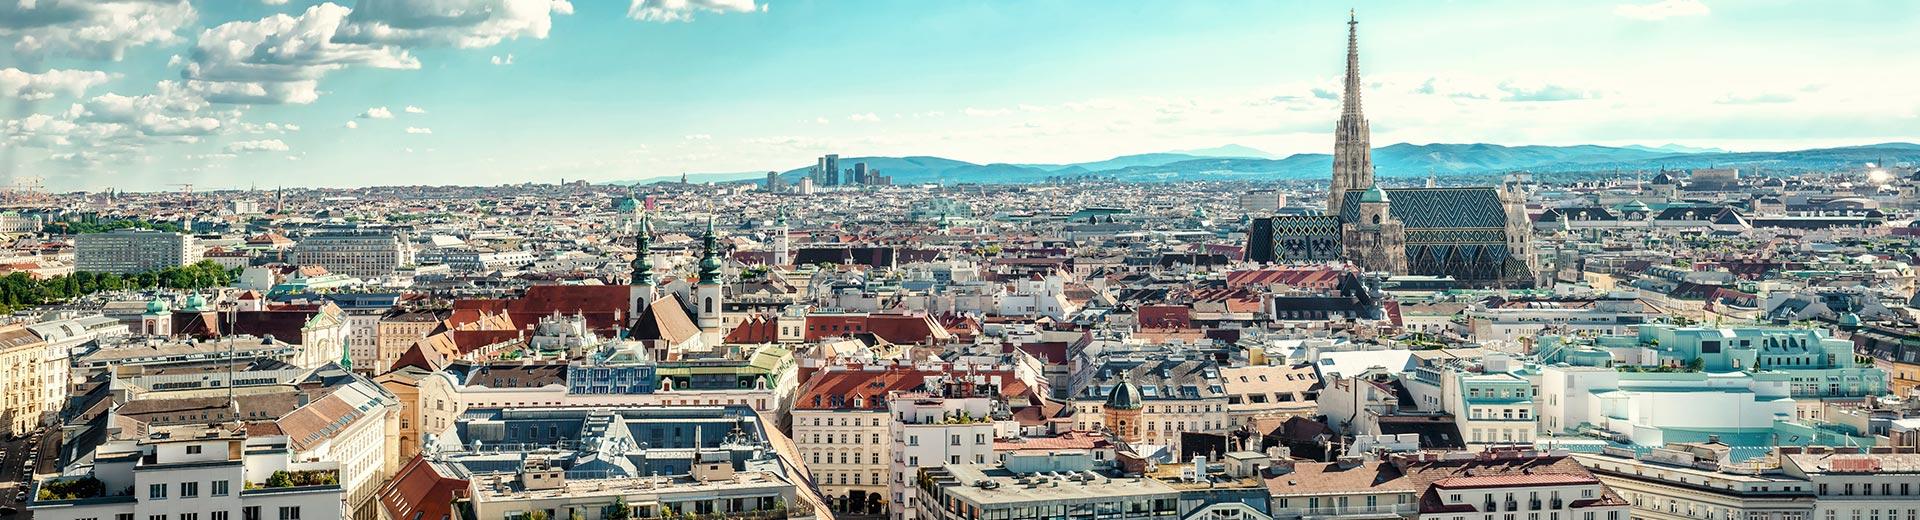 Gruppenreise Wien - Package Gruppen Select Bahn